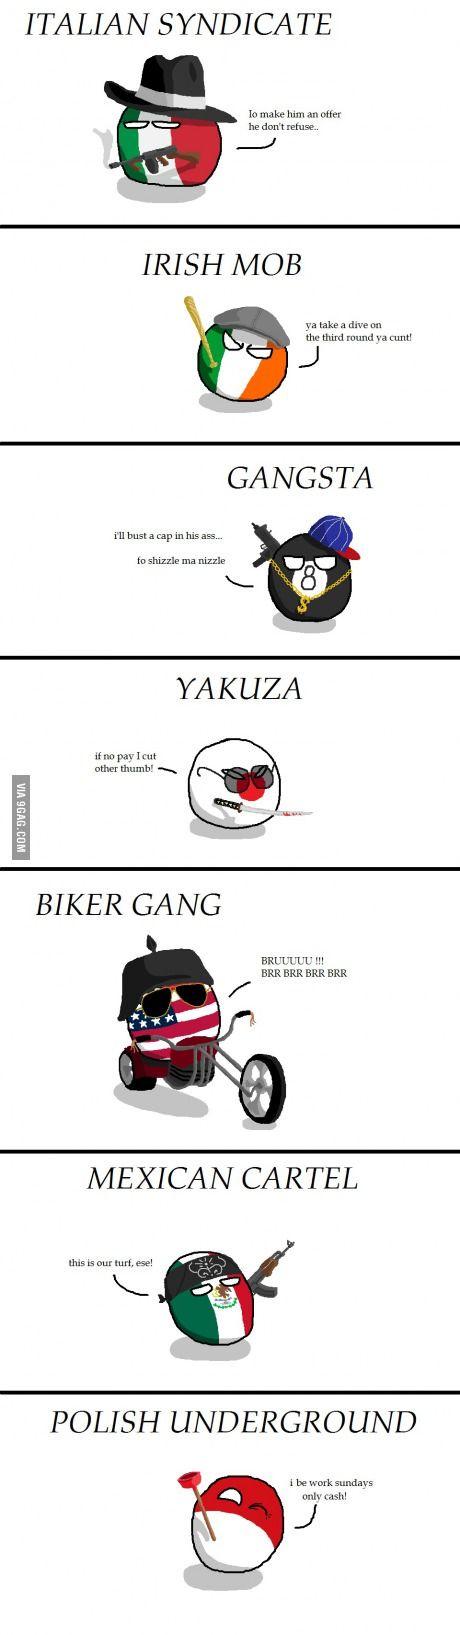 Organized crime around the world